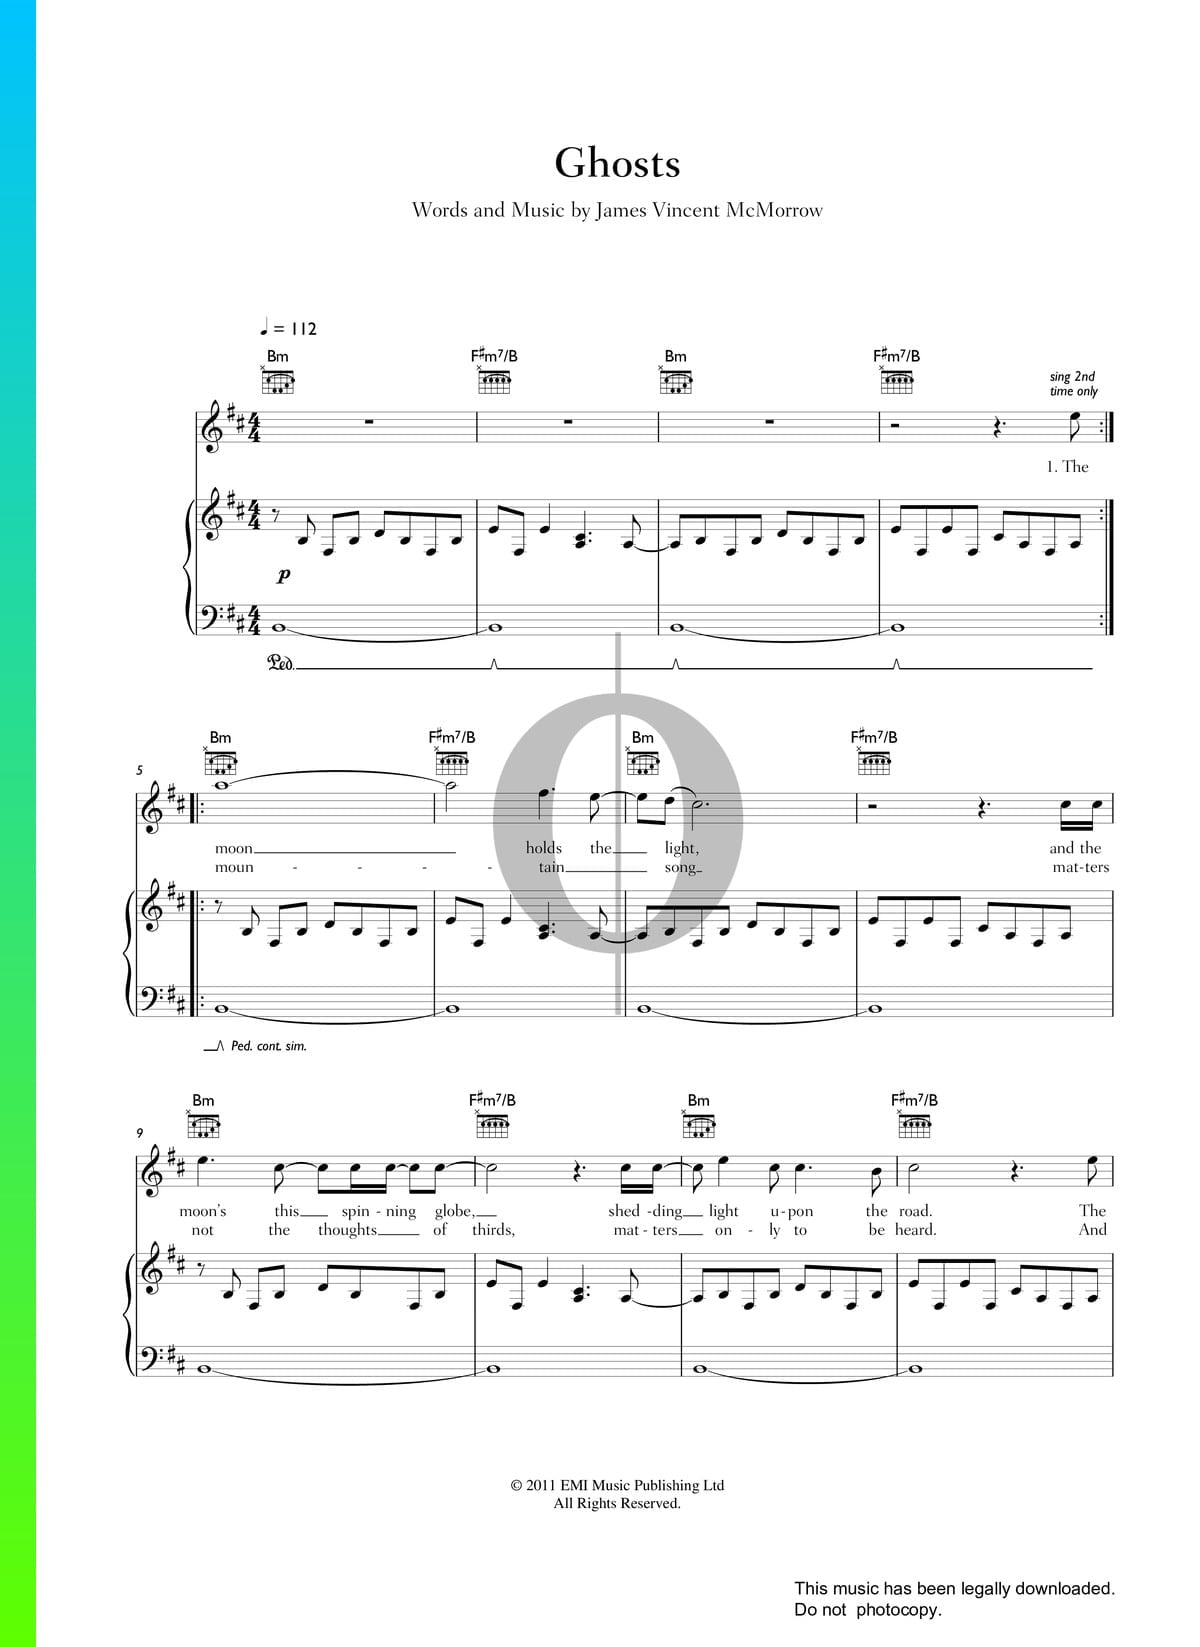 ▷ ghosts sheet music (piano, voice, guitar) - pdf download & streaming -  oktav  oktav